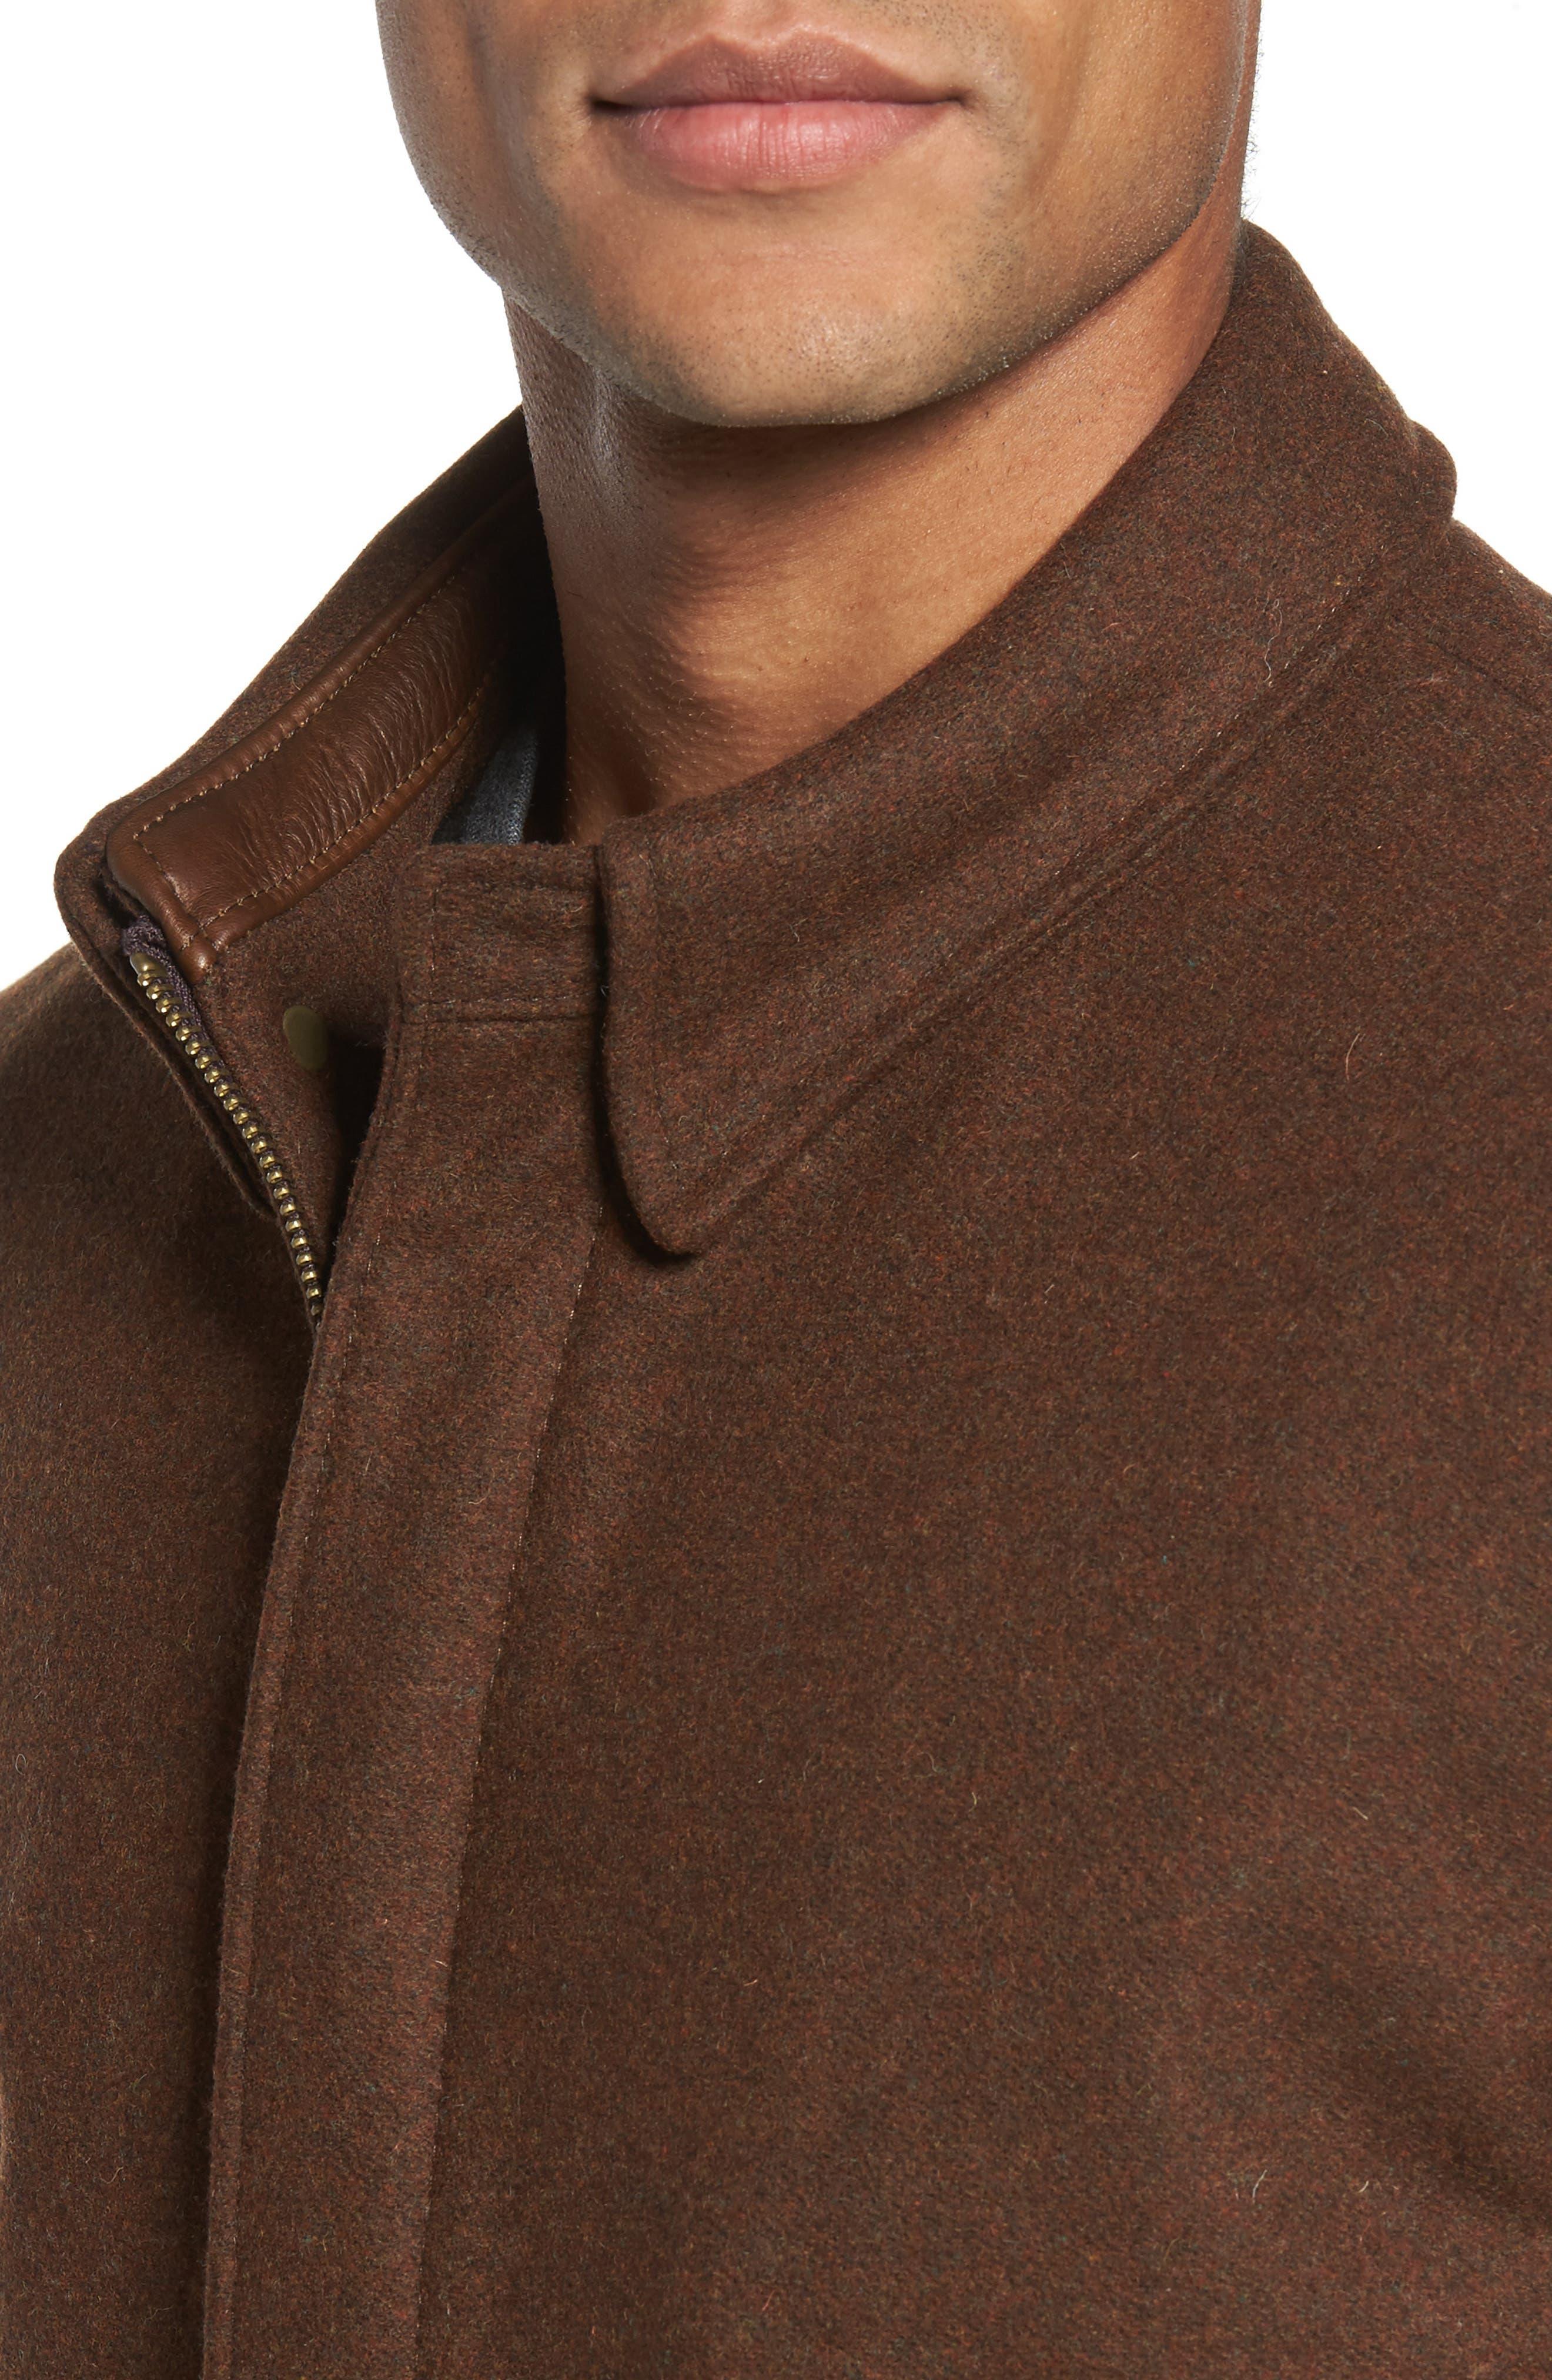 Liberty Wool Blend Zip Front Jacket,                             Alternate thumbnail 4, color,                             200